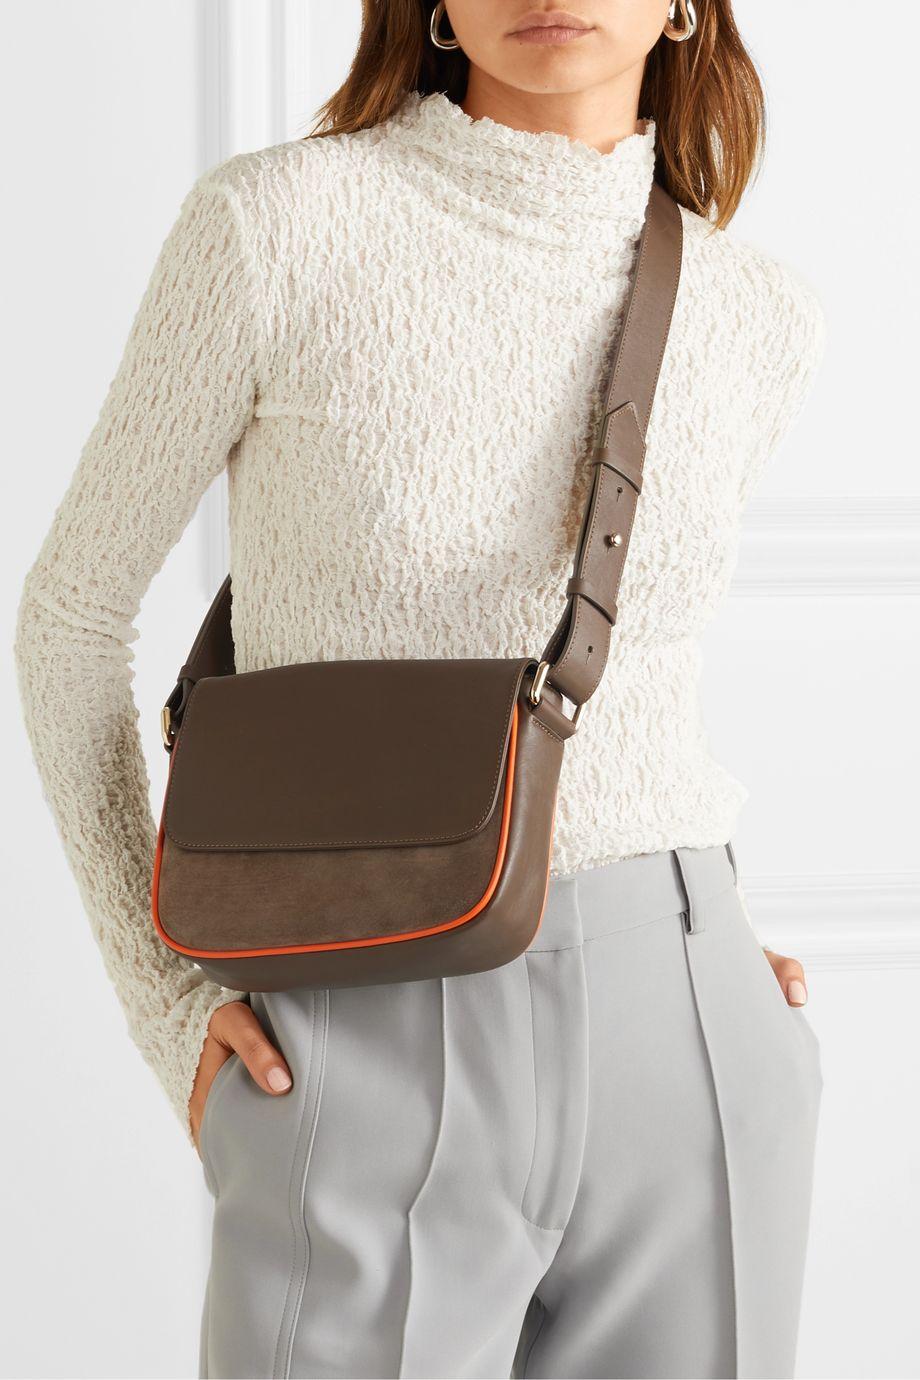 ZOOBEETLE Paris Dauphine Madame leather and suede shoulder bag